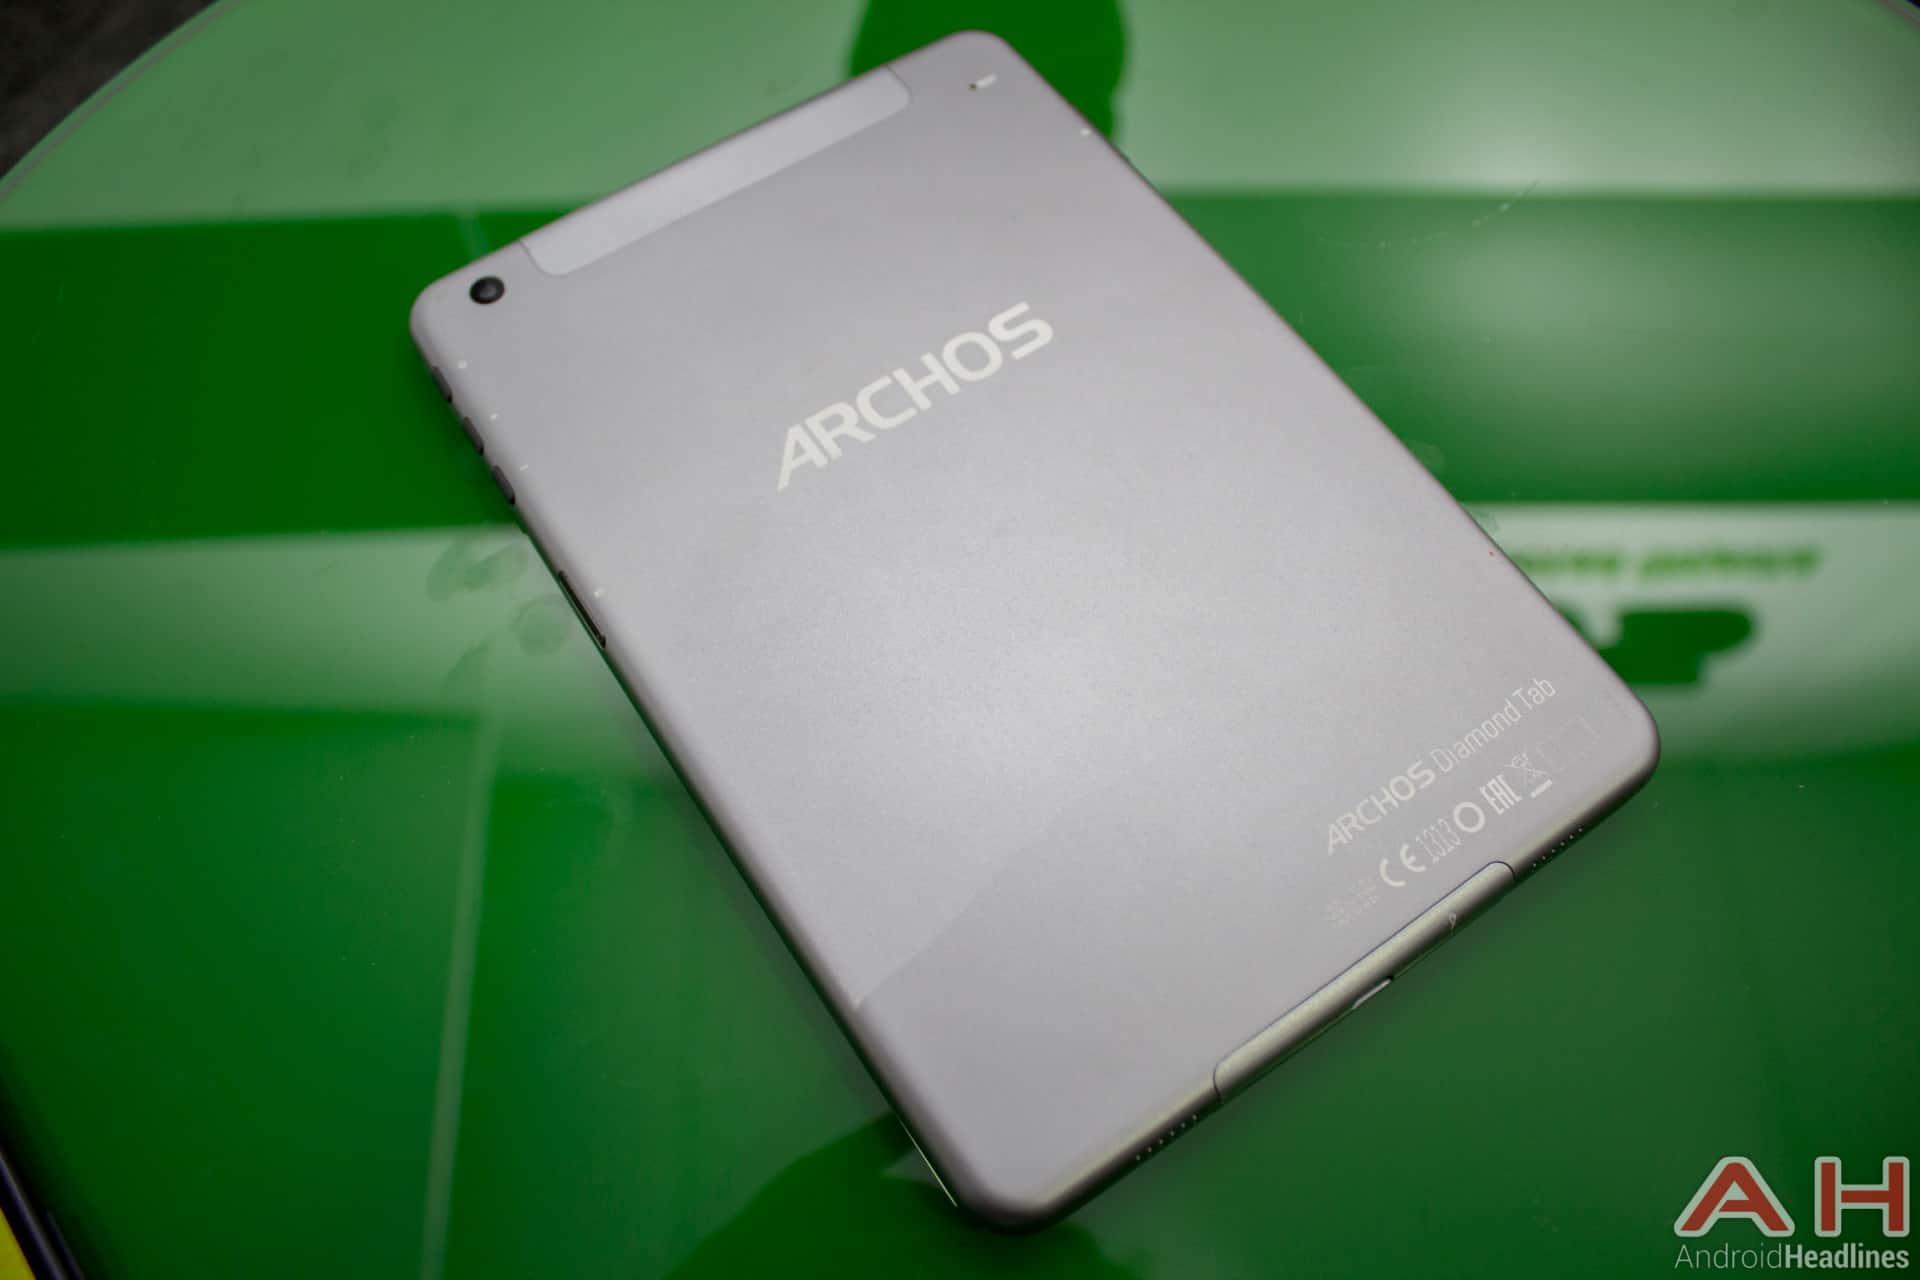 Archos Diamond Tablet IFA AH 2